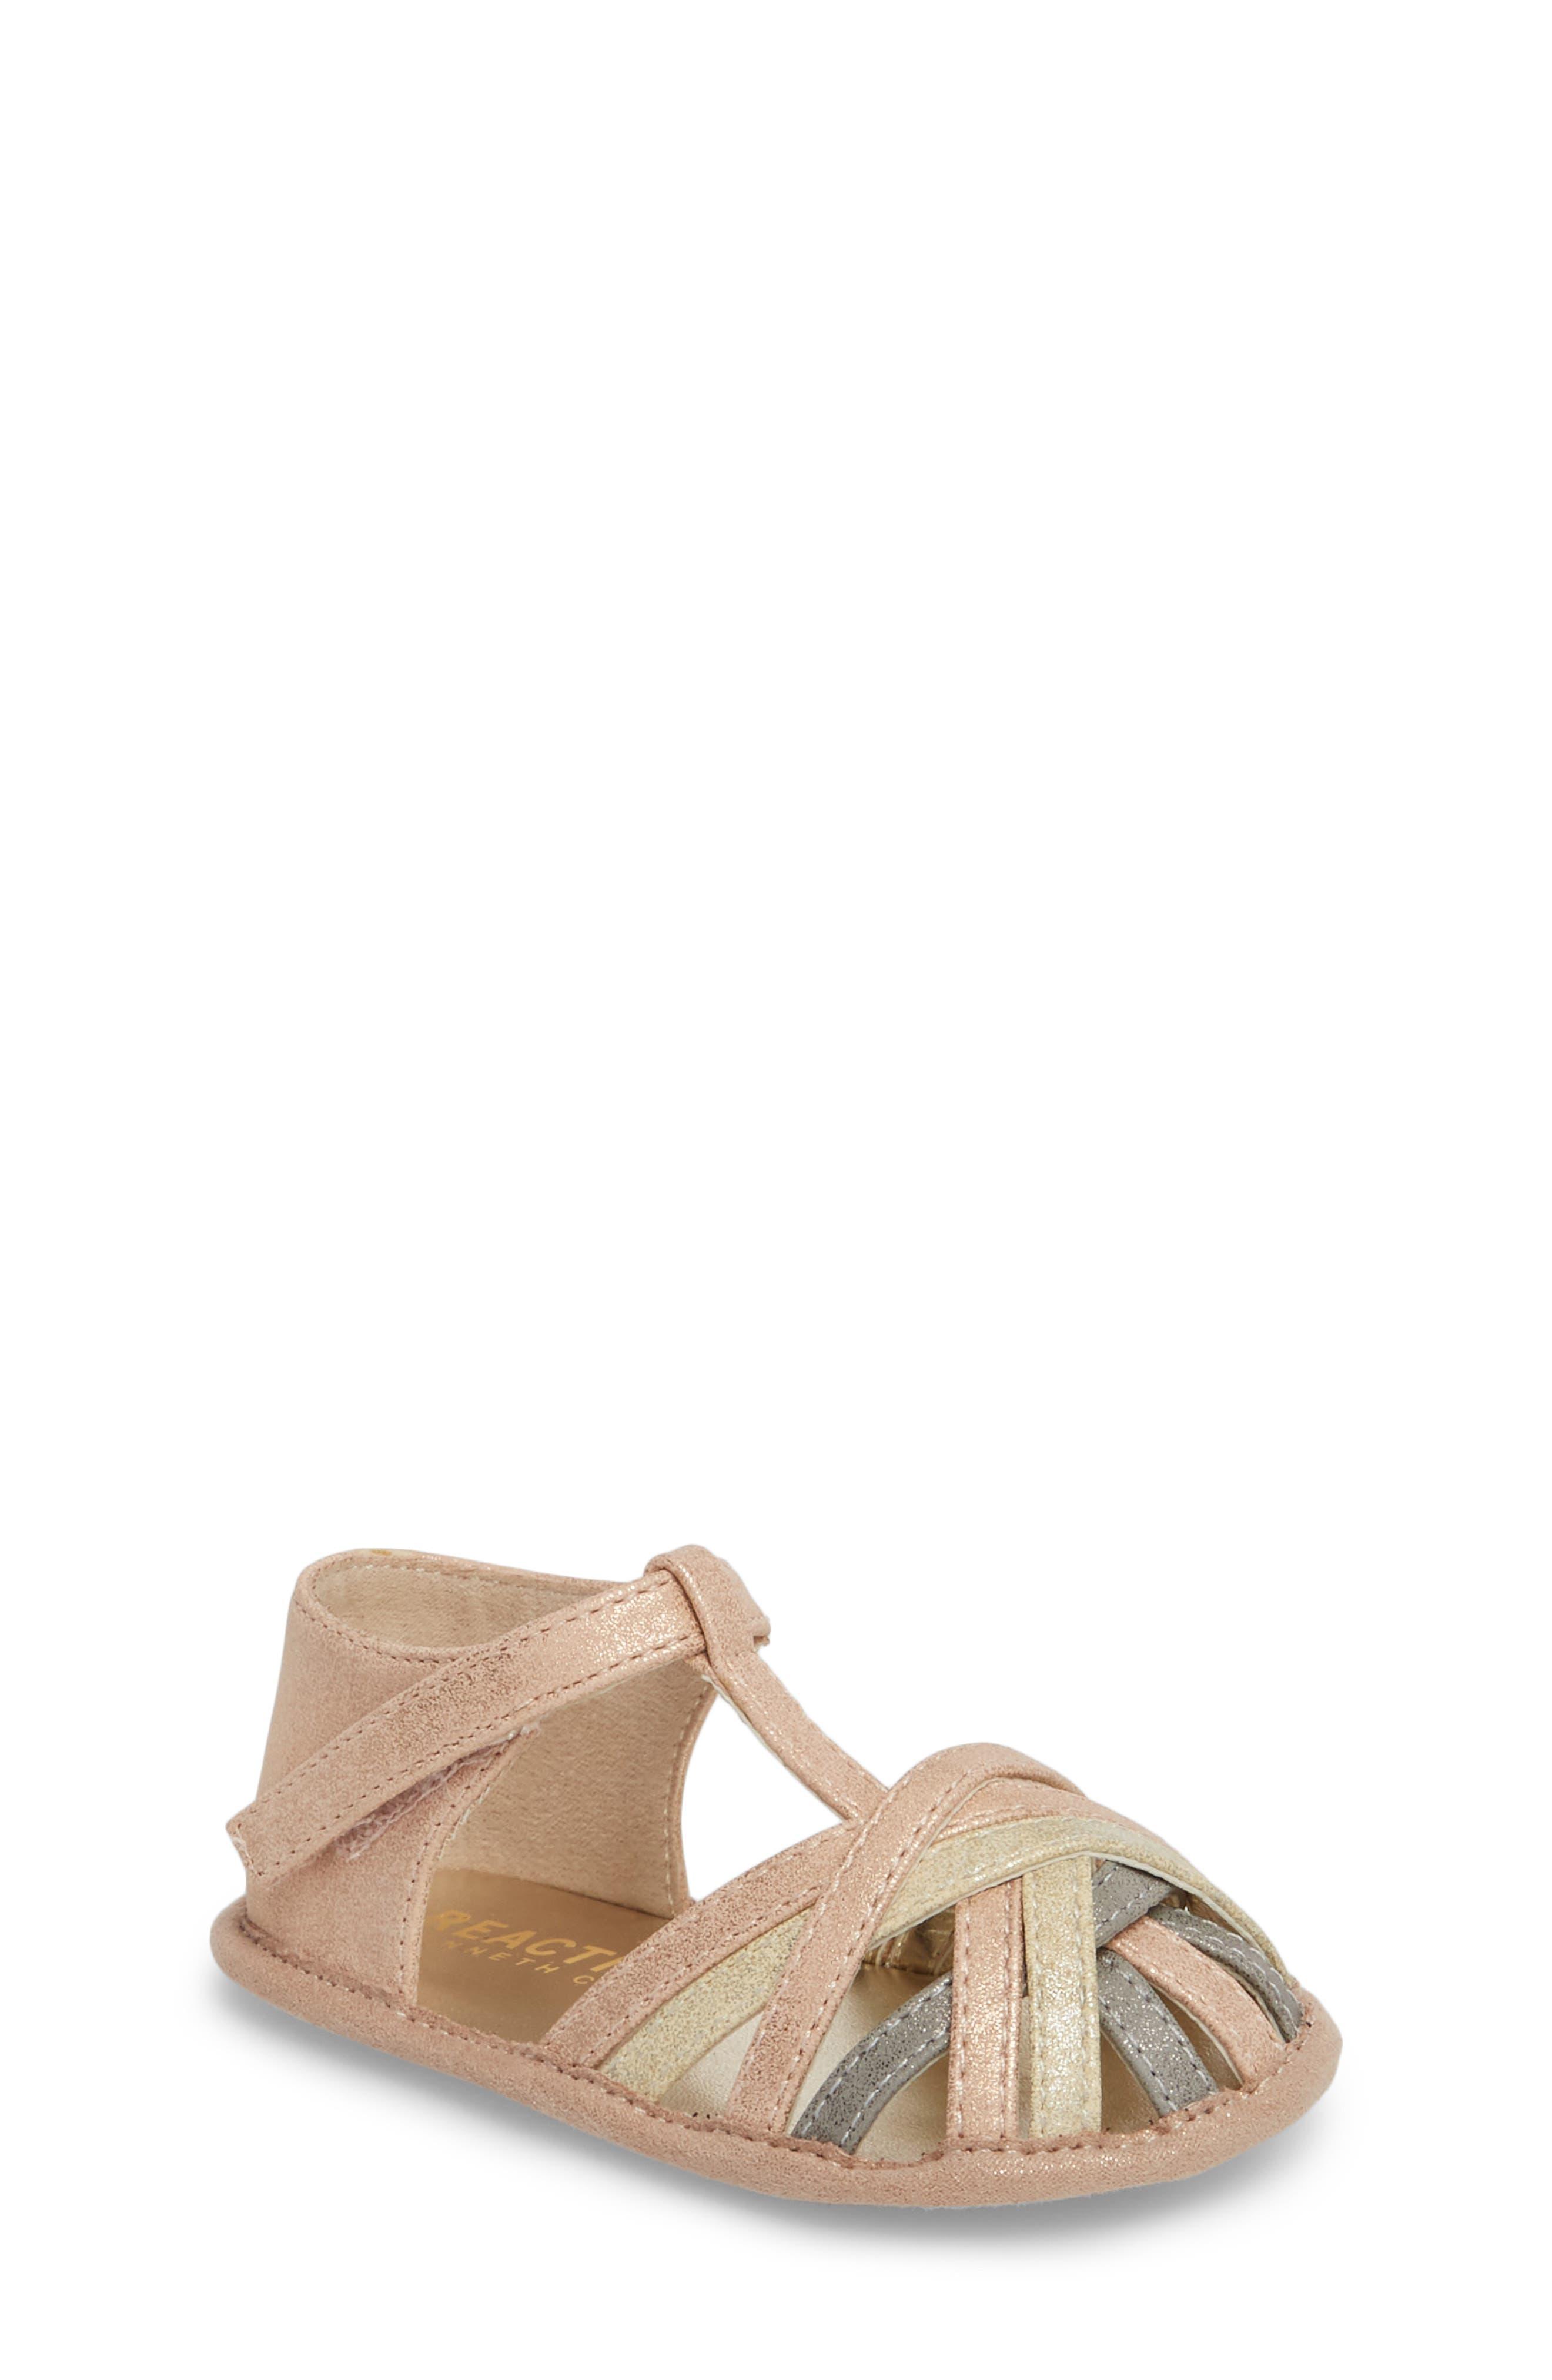 Wisp Metallic Sandal,                             Main thumbnail 1, color,                             Rose Gold